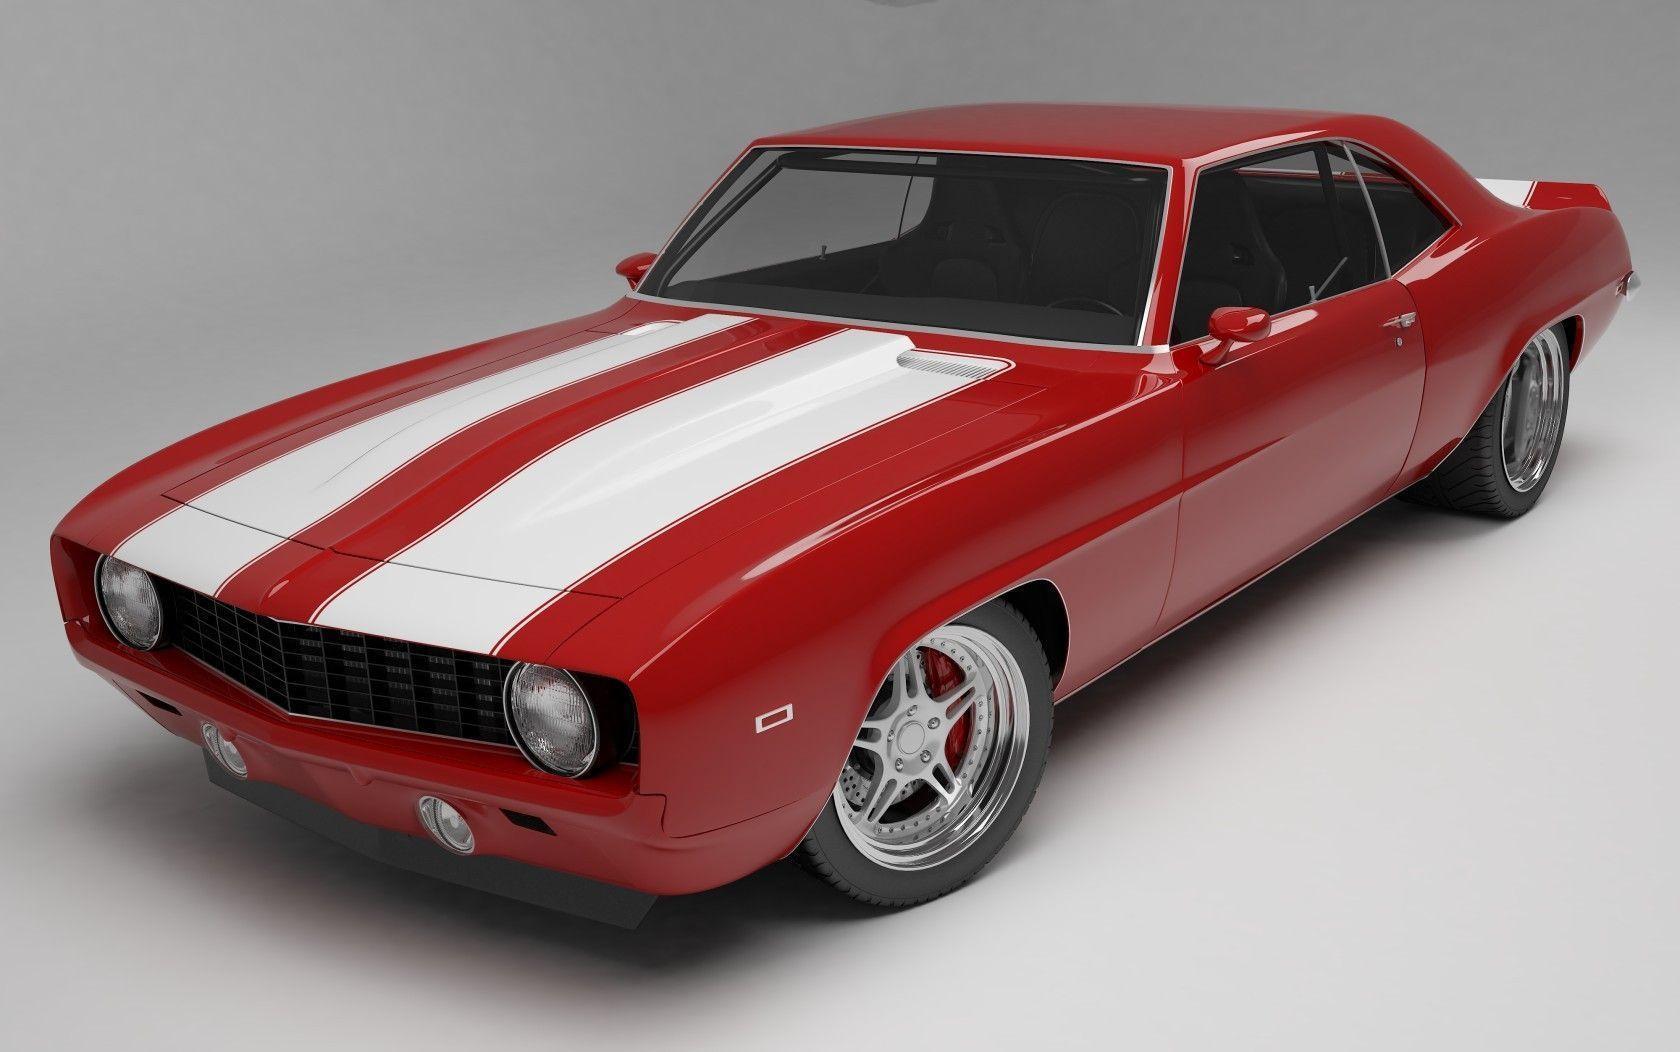 1969 Camaro Wallpapers...1969 Camaro Hd Wallpaper